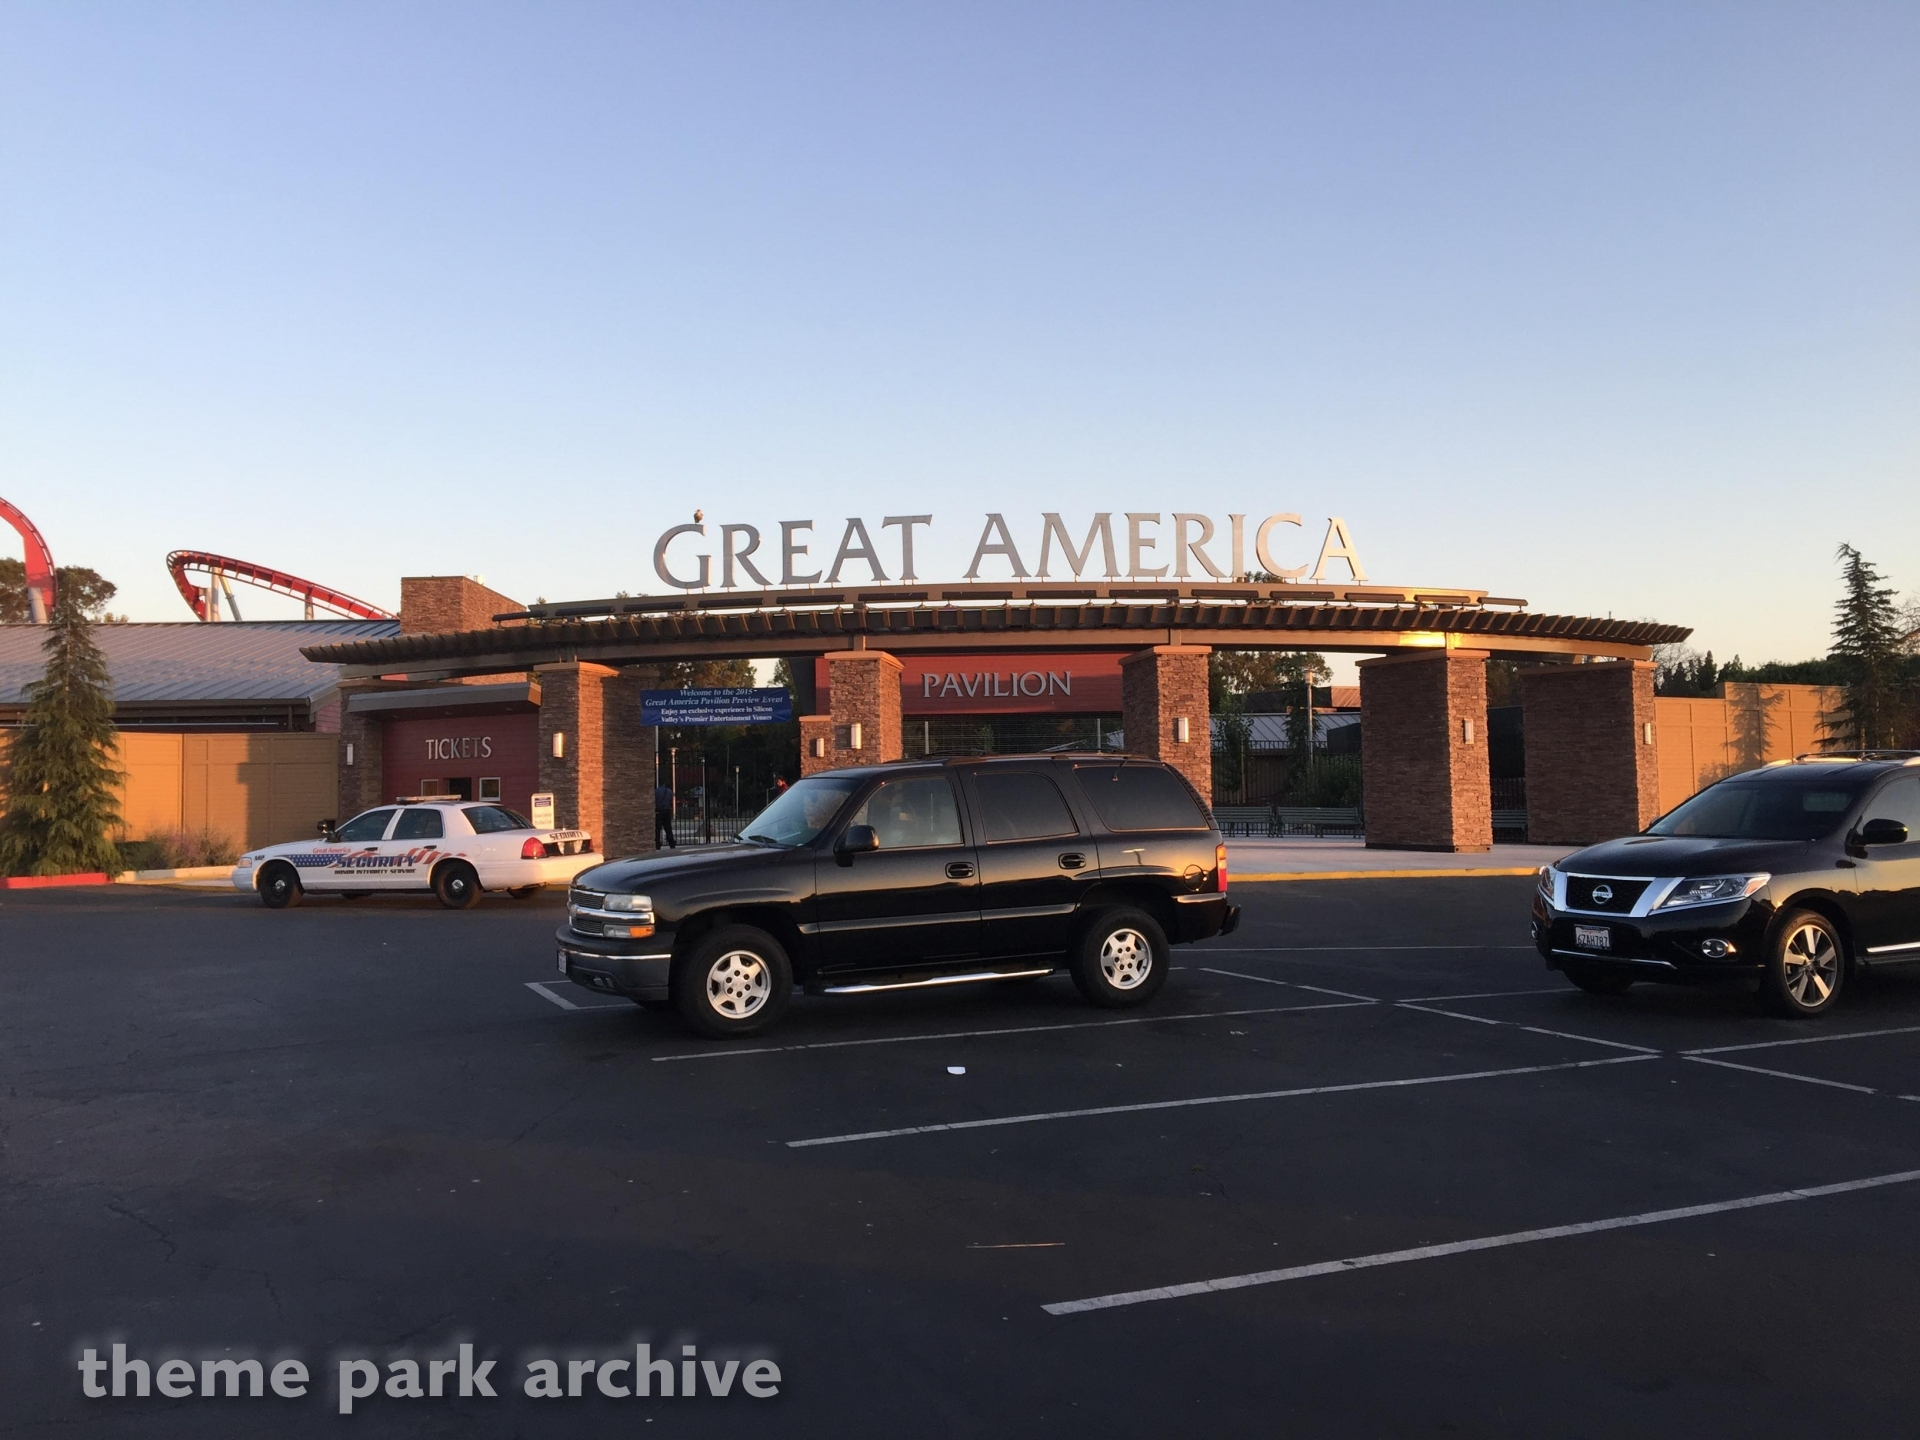 Great America Pavilion at California's Great America